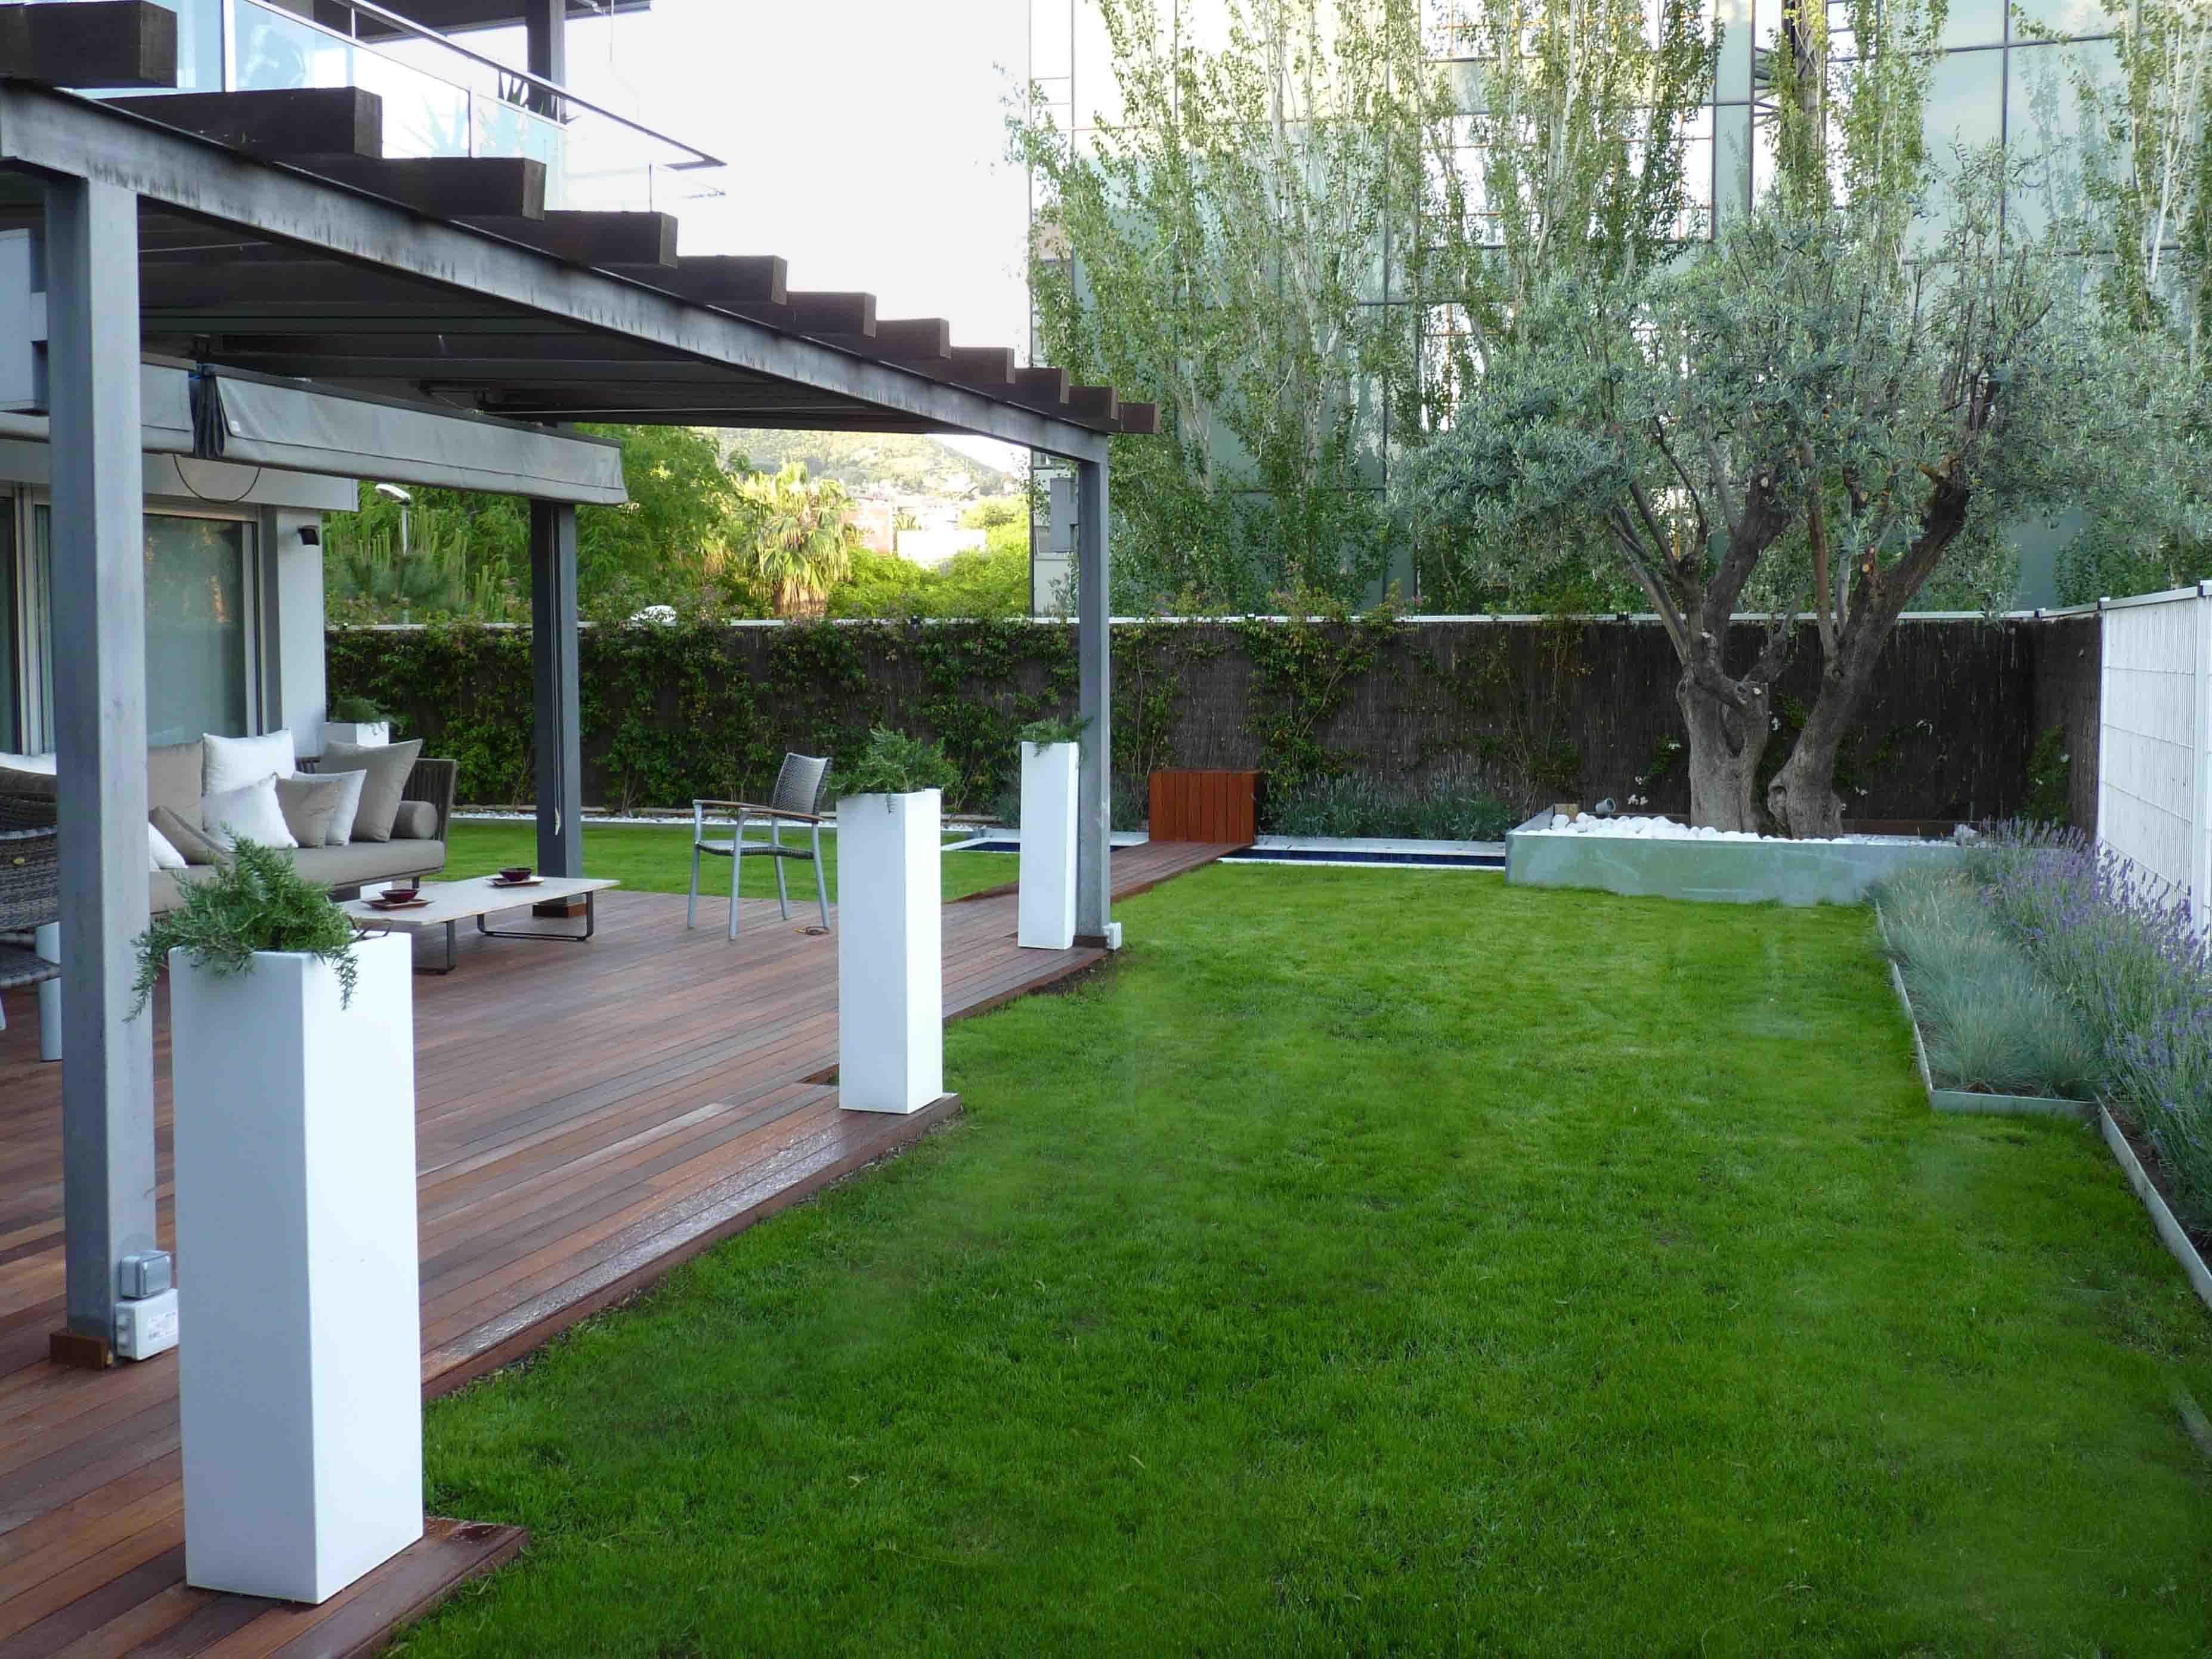 Qu me aporta un paisajista en mi jard n more patios for Ideas para mi jardin